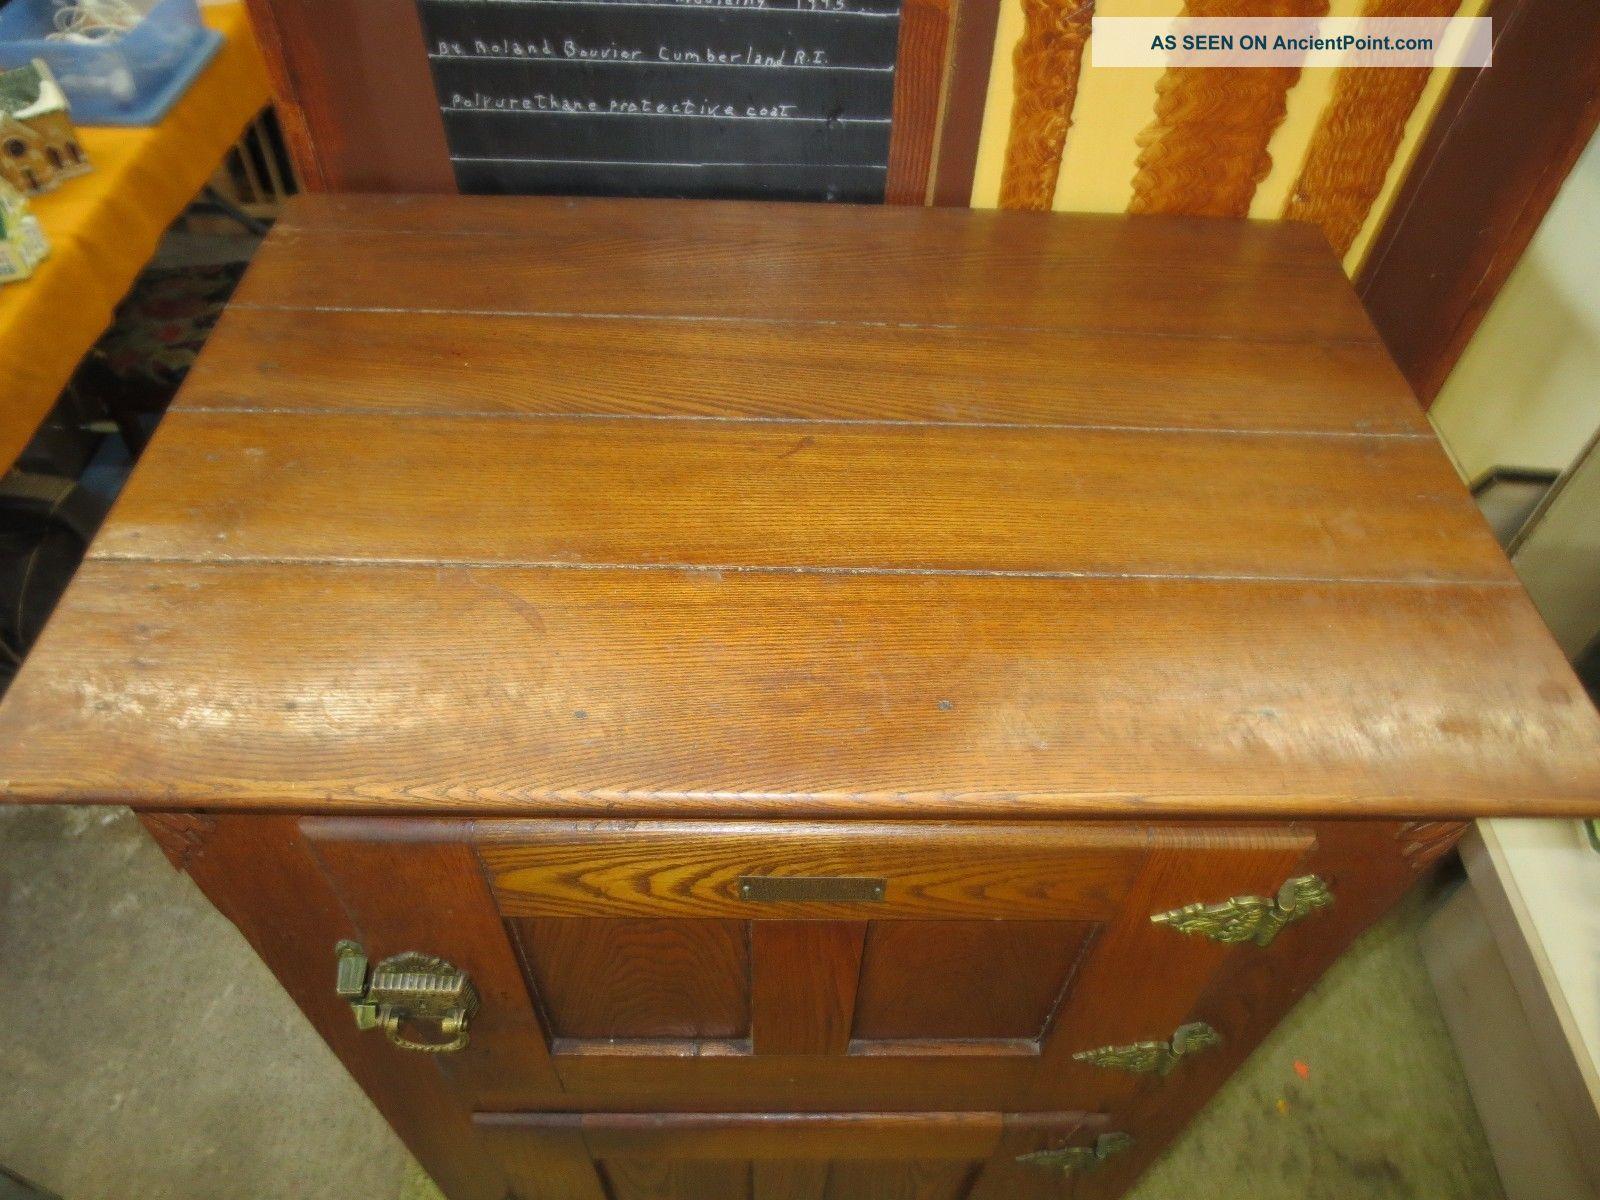 Antique Wood Ice Box Golden Oak Authentic Mckee Refrigerator Company Brooklyn Ny Ice Boxes photo